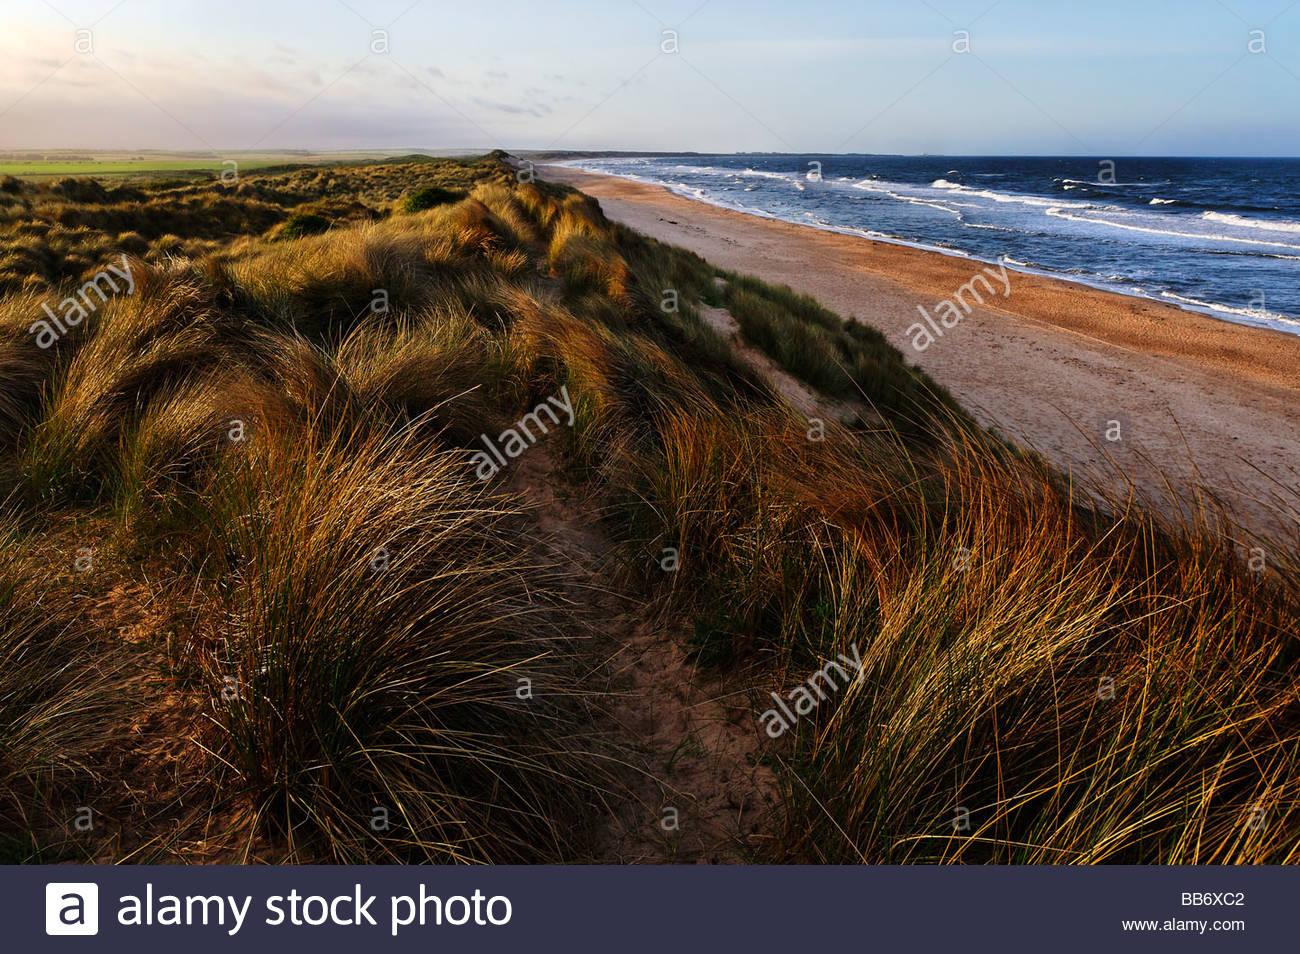 Dunes and beach - Stock Image